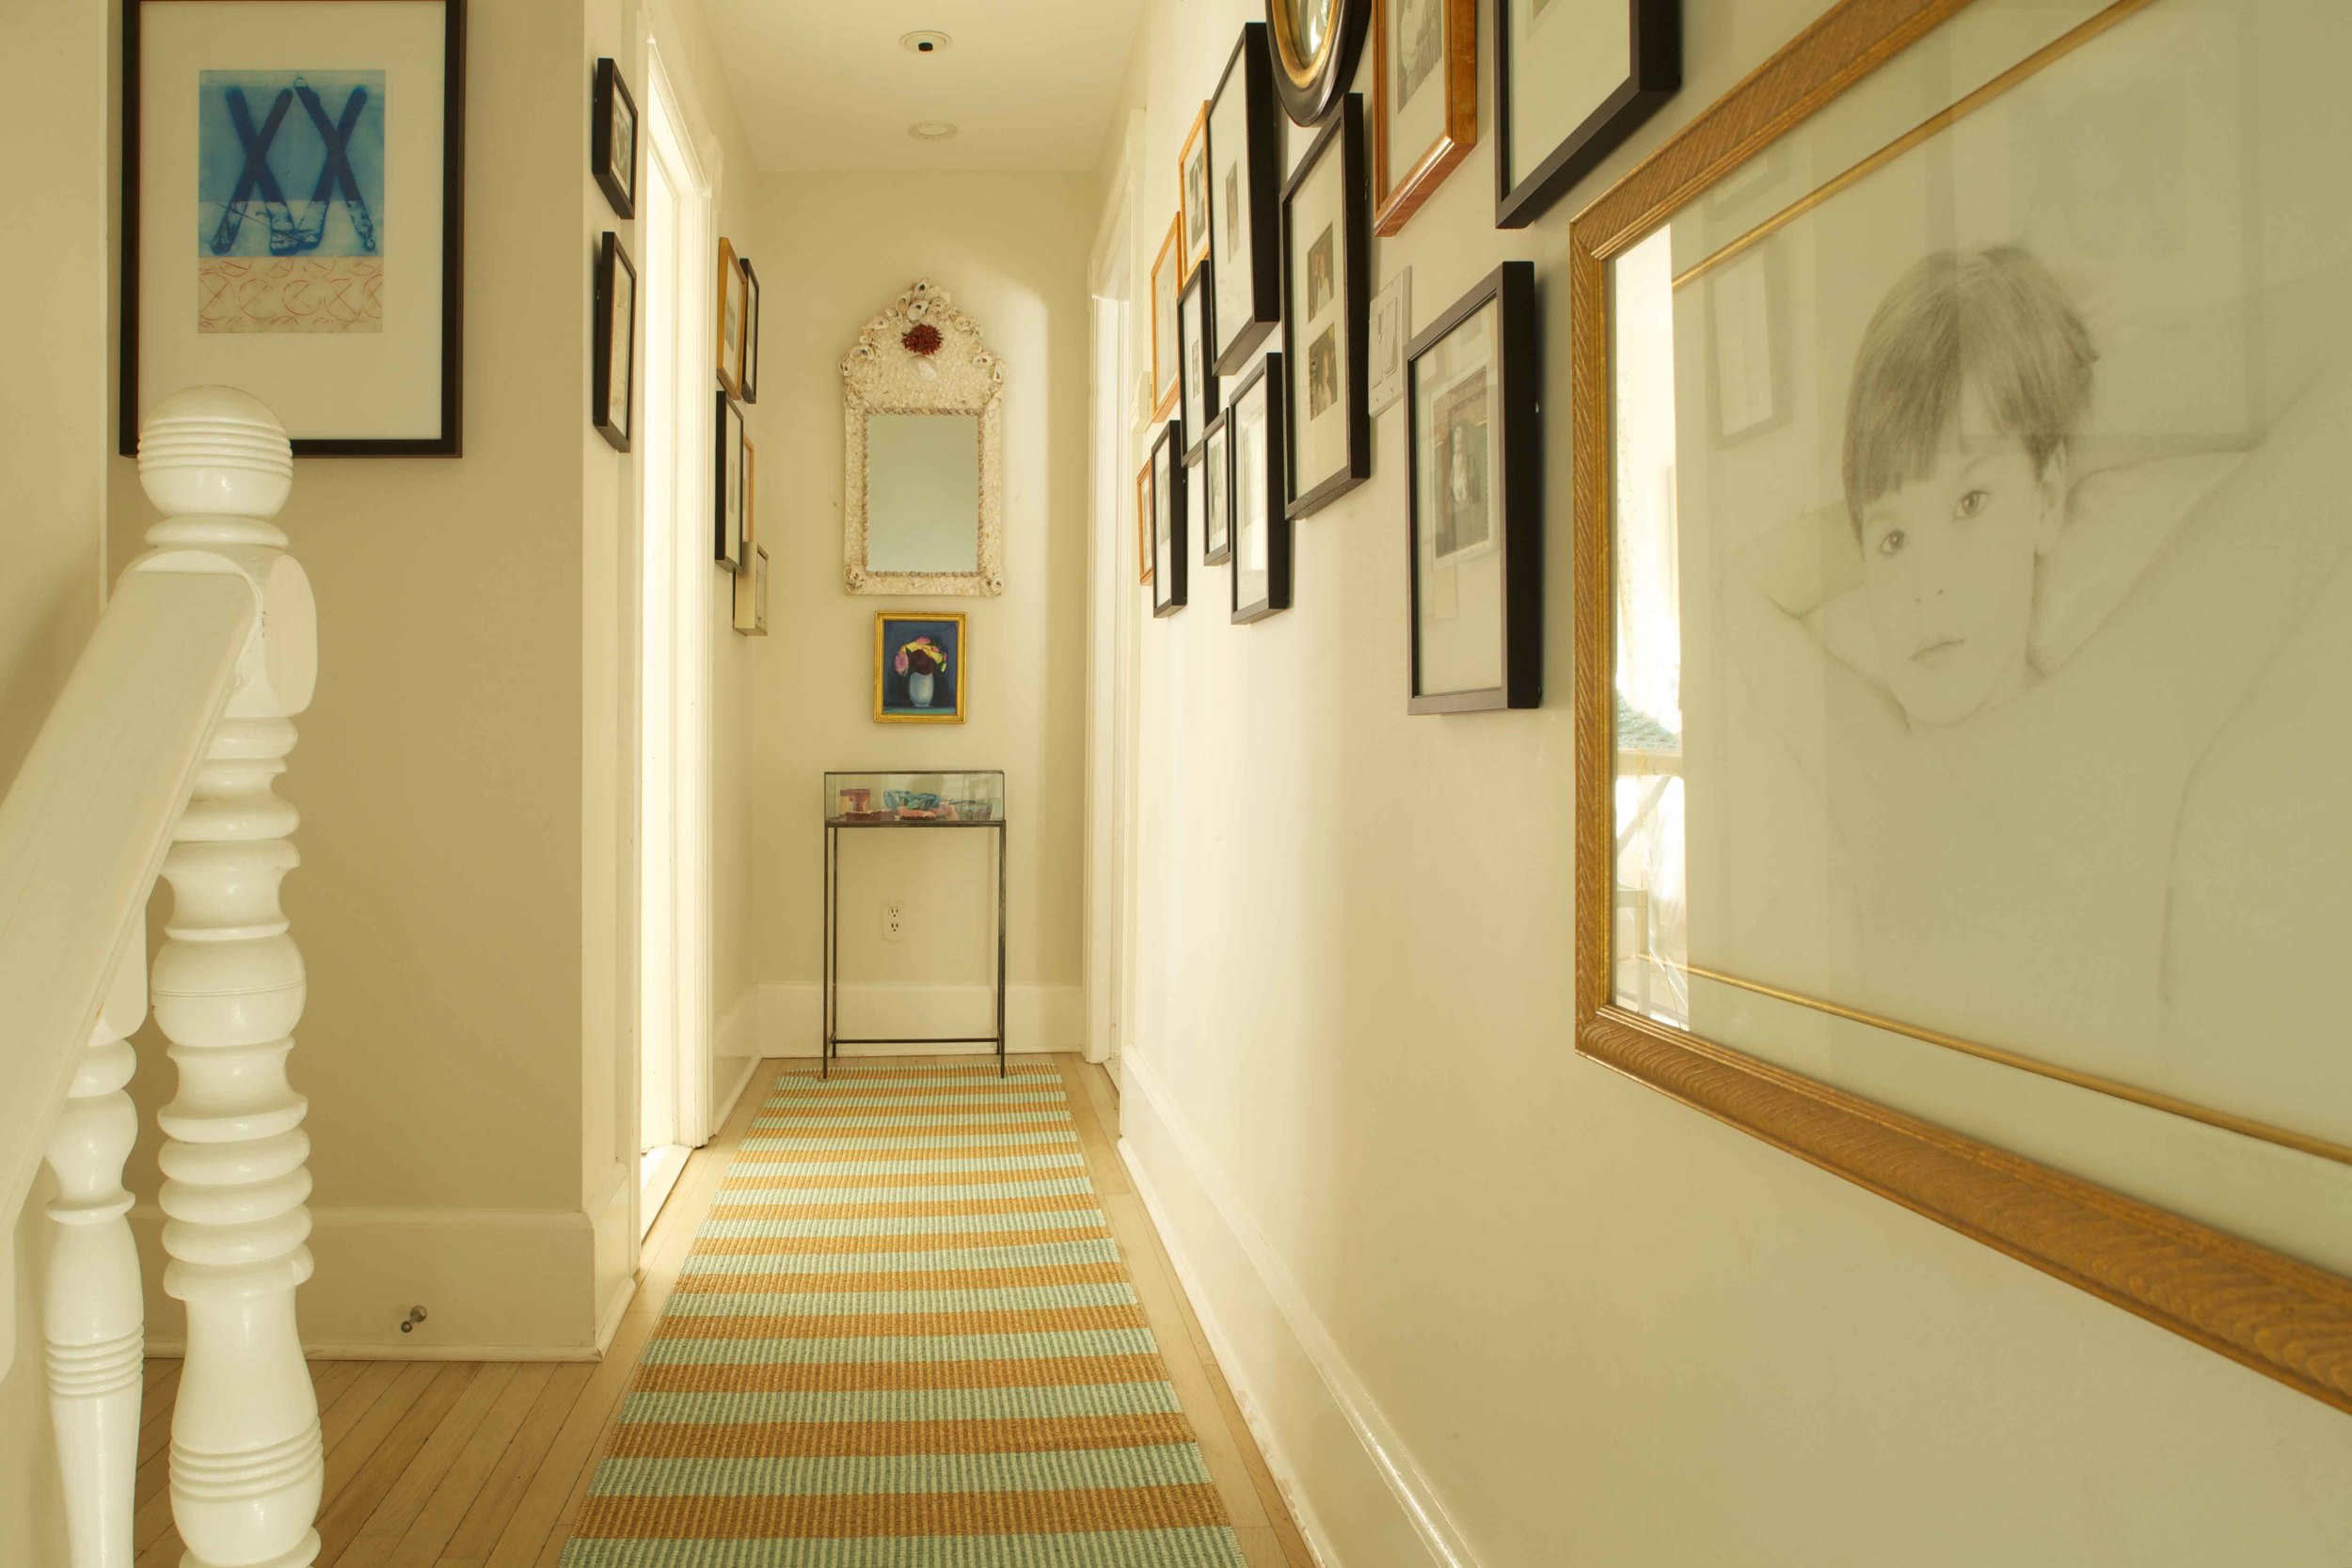 Website-dupont hallway.jpg